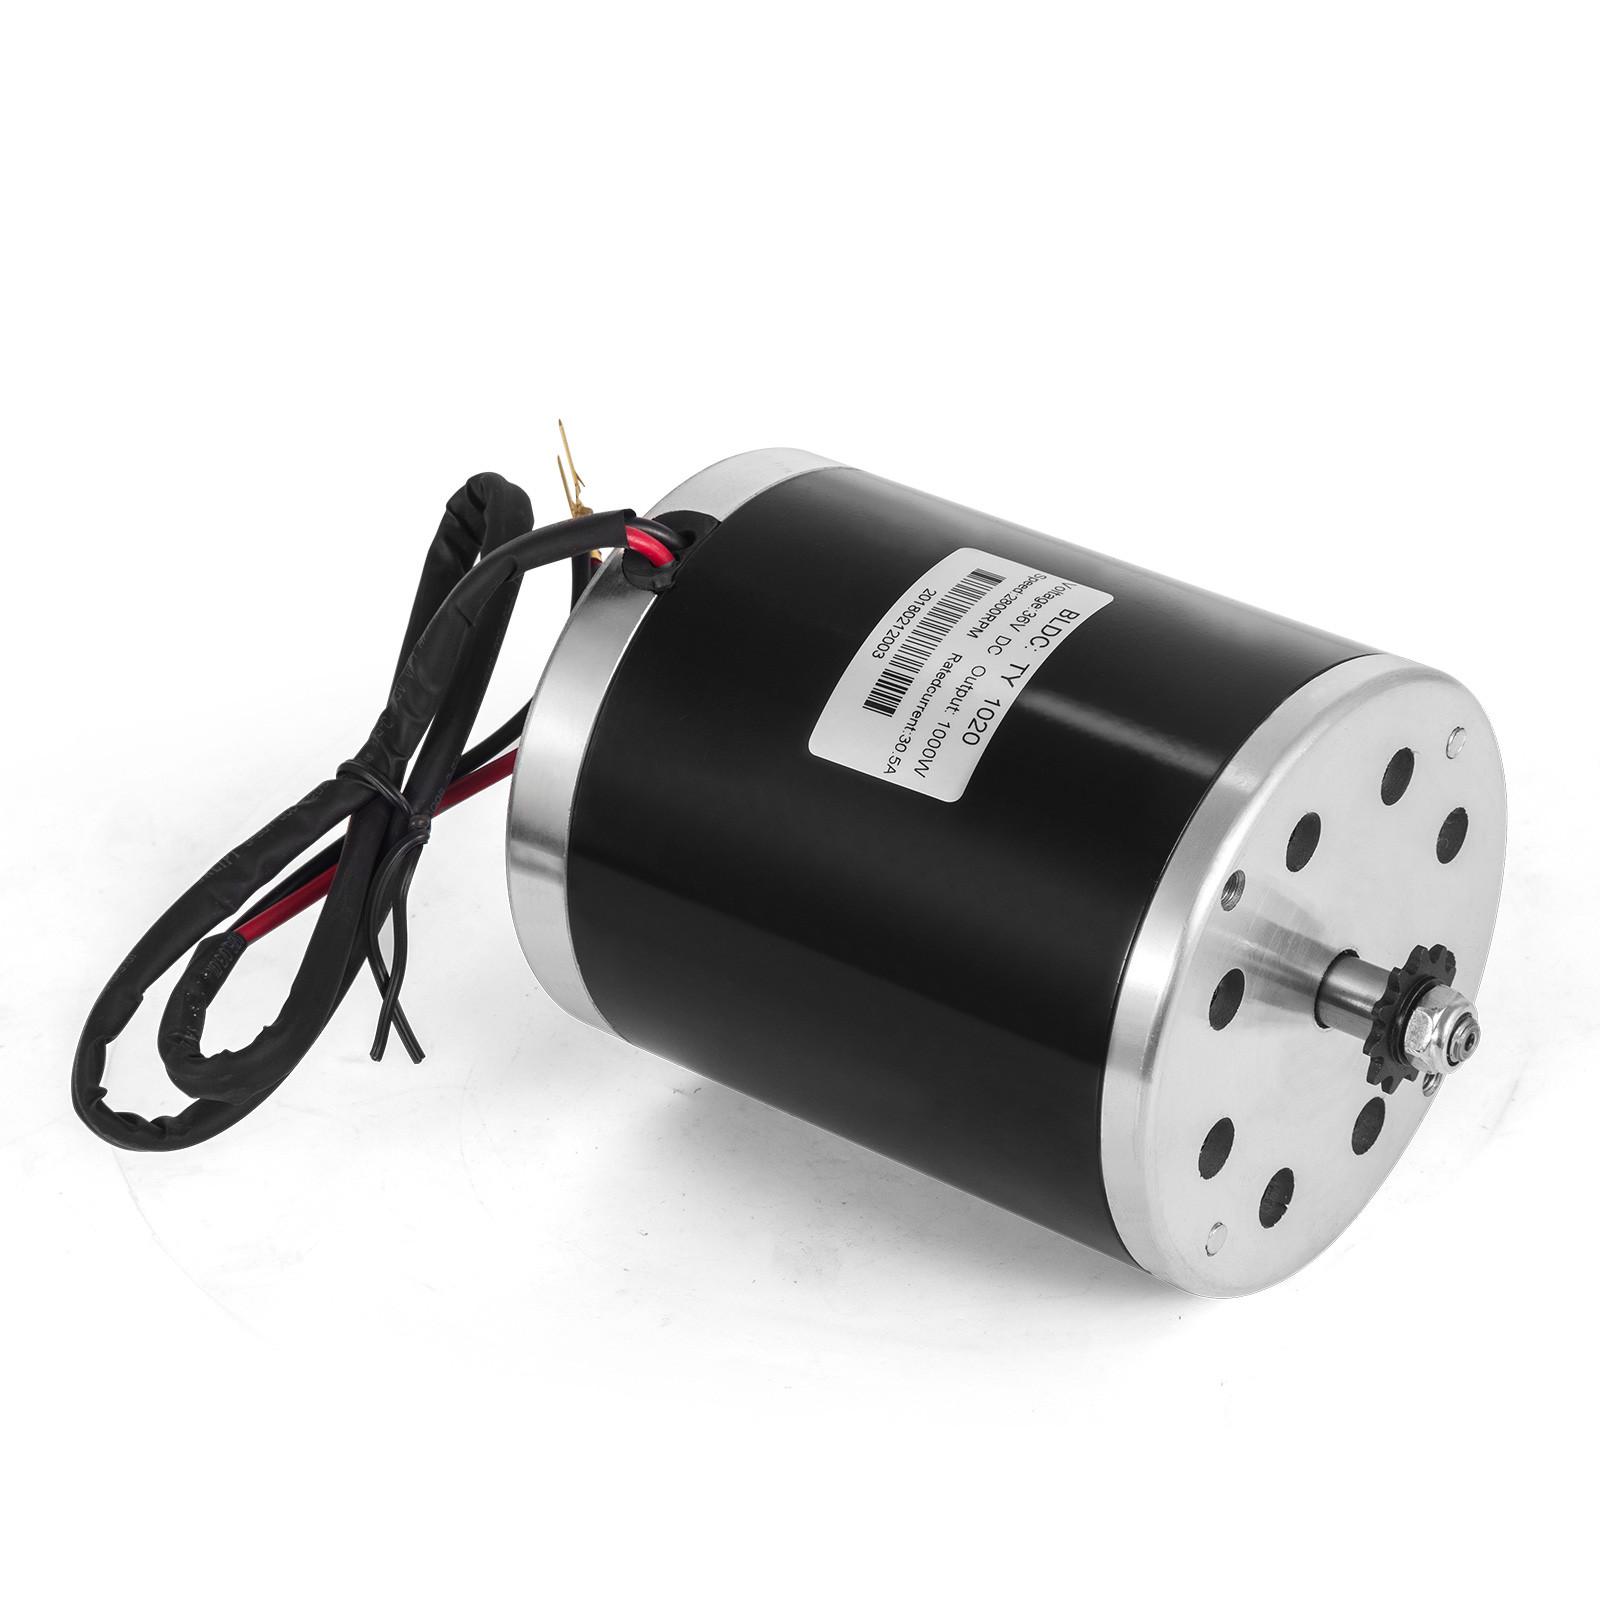 36v-Electric-Motor-controller-throttle-kit-f-Scooter-E-Scooter-ATV-Permanent thumbnail 99